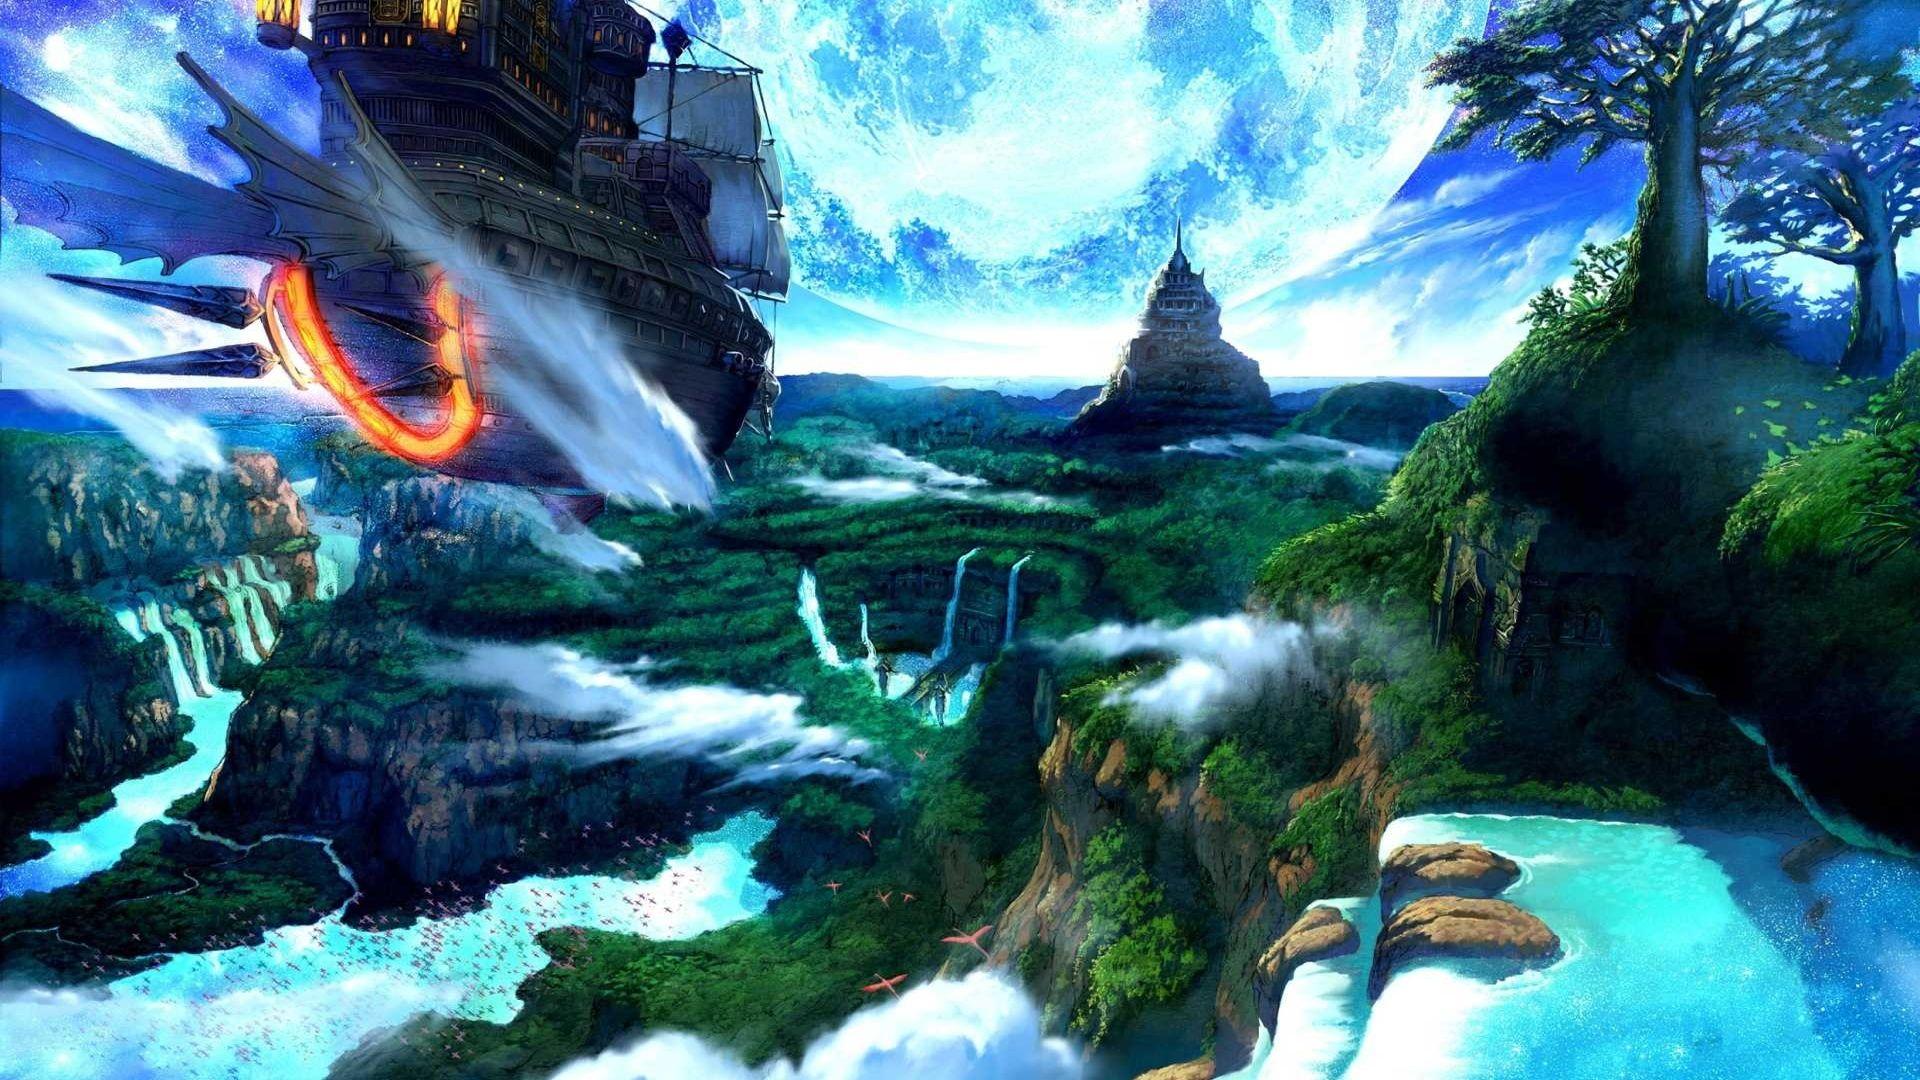 computergrafik landschaften | Fantasy - Landschaft ...